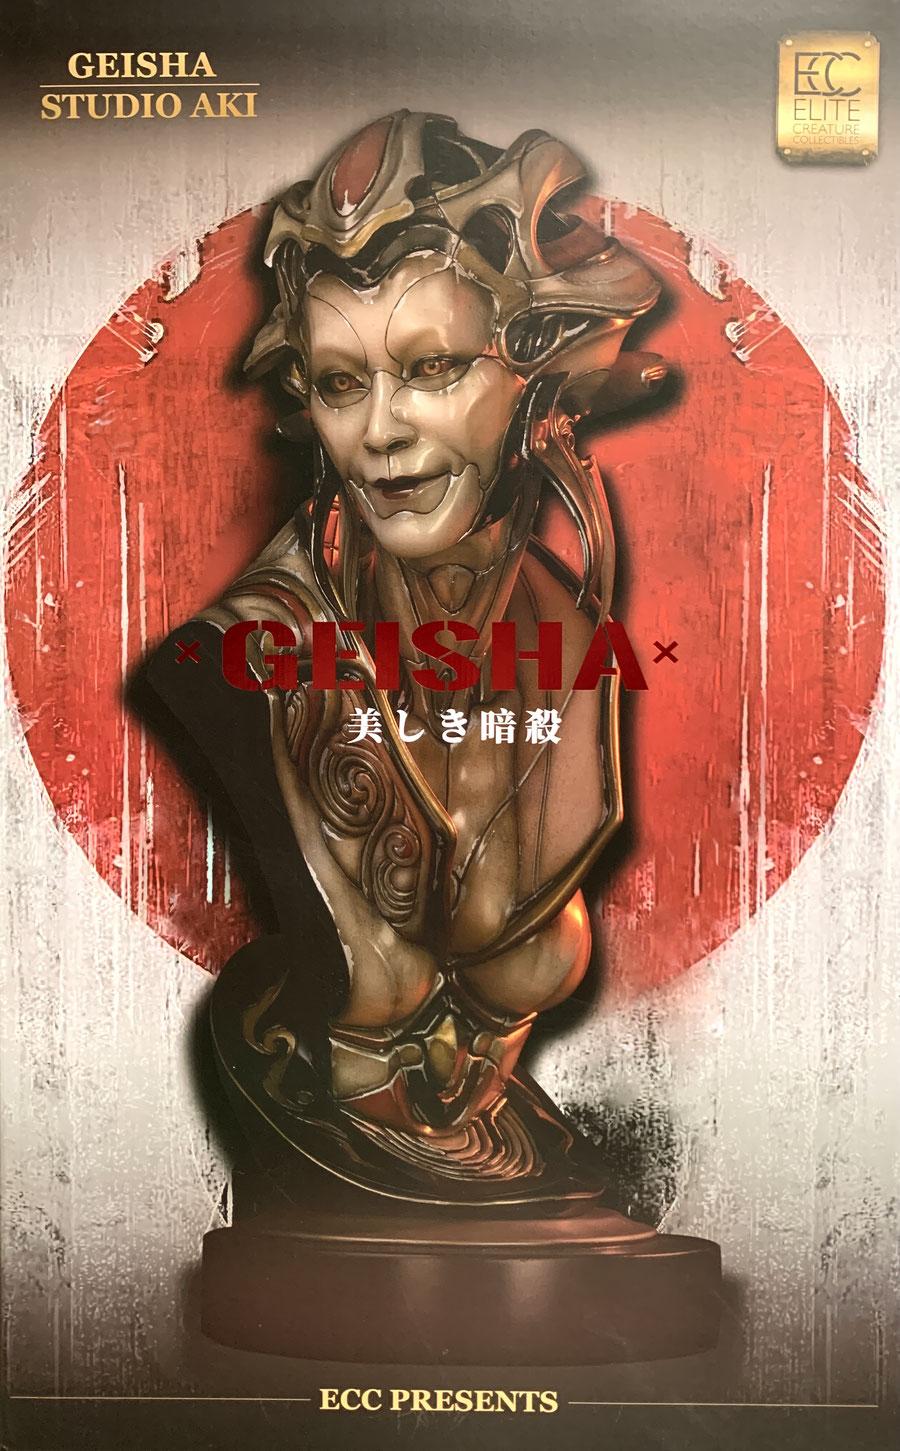 Geisha 1/1 Life-Size Büste by Akihito 81cm ECC